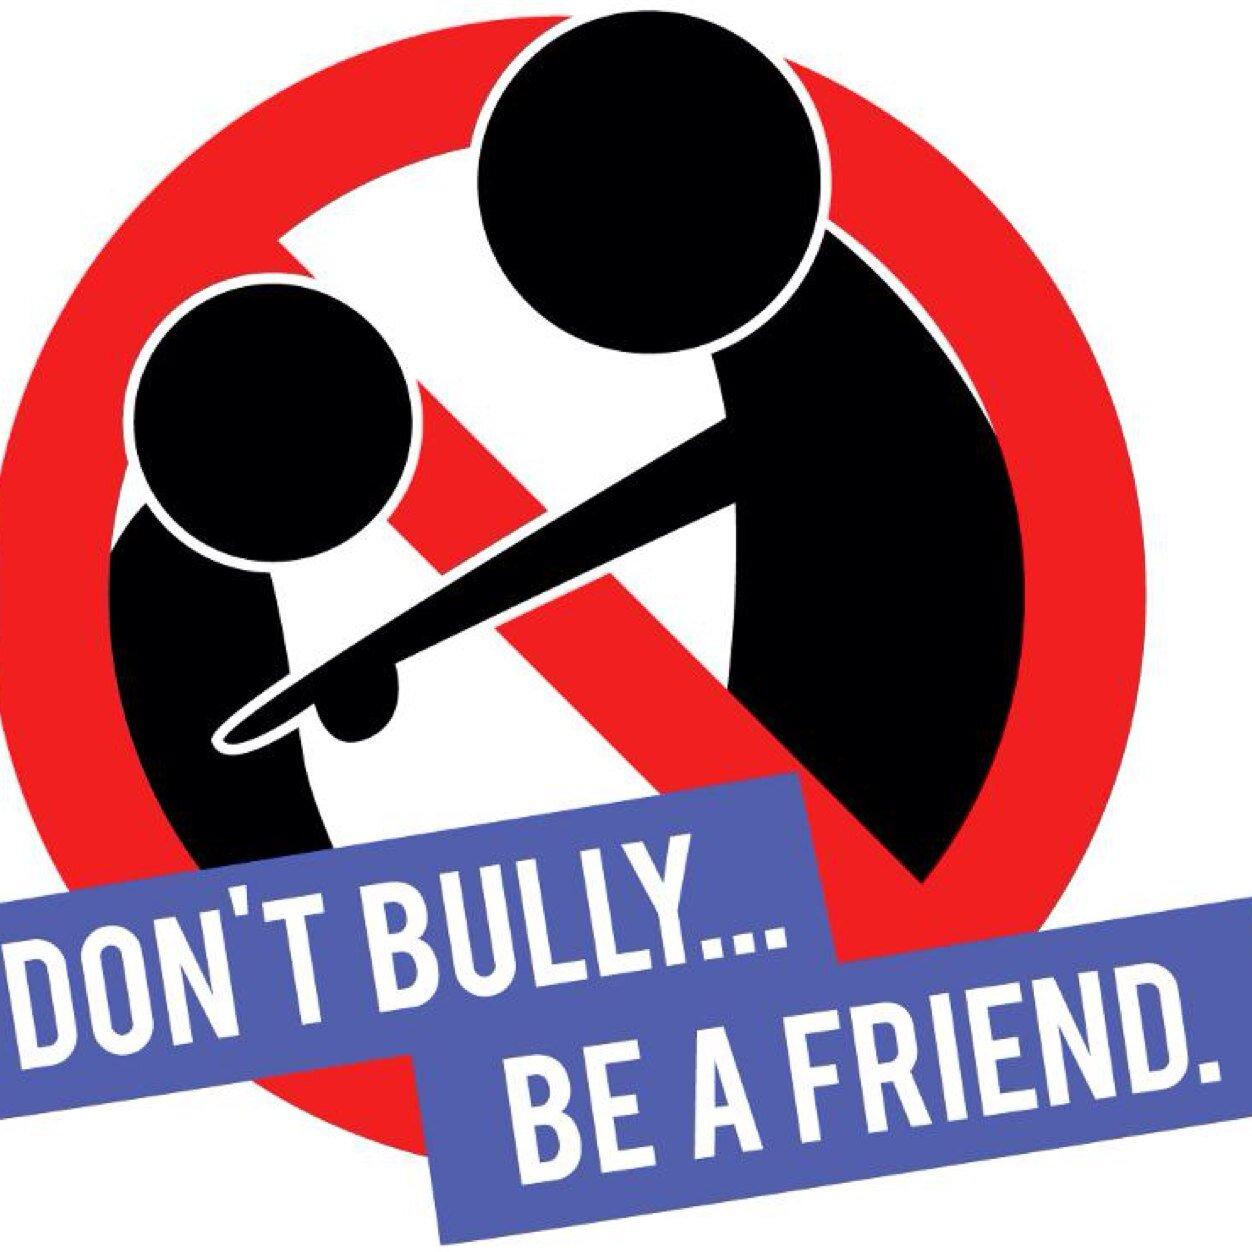 no bullying awwdontbully twitter